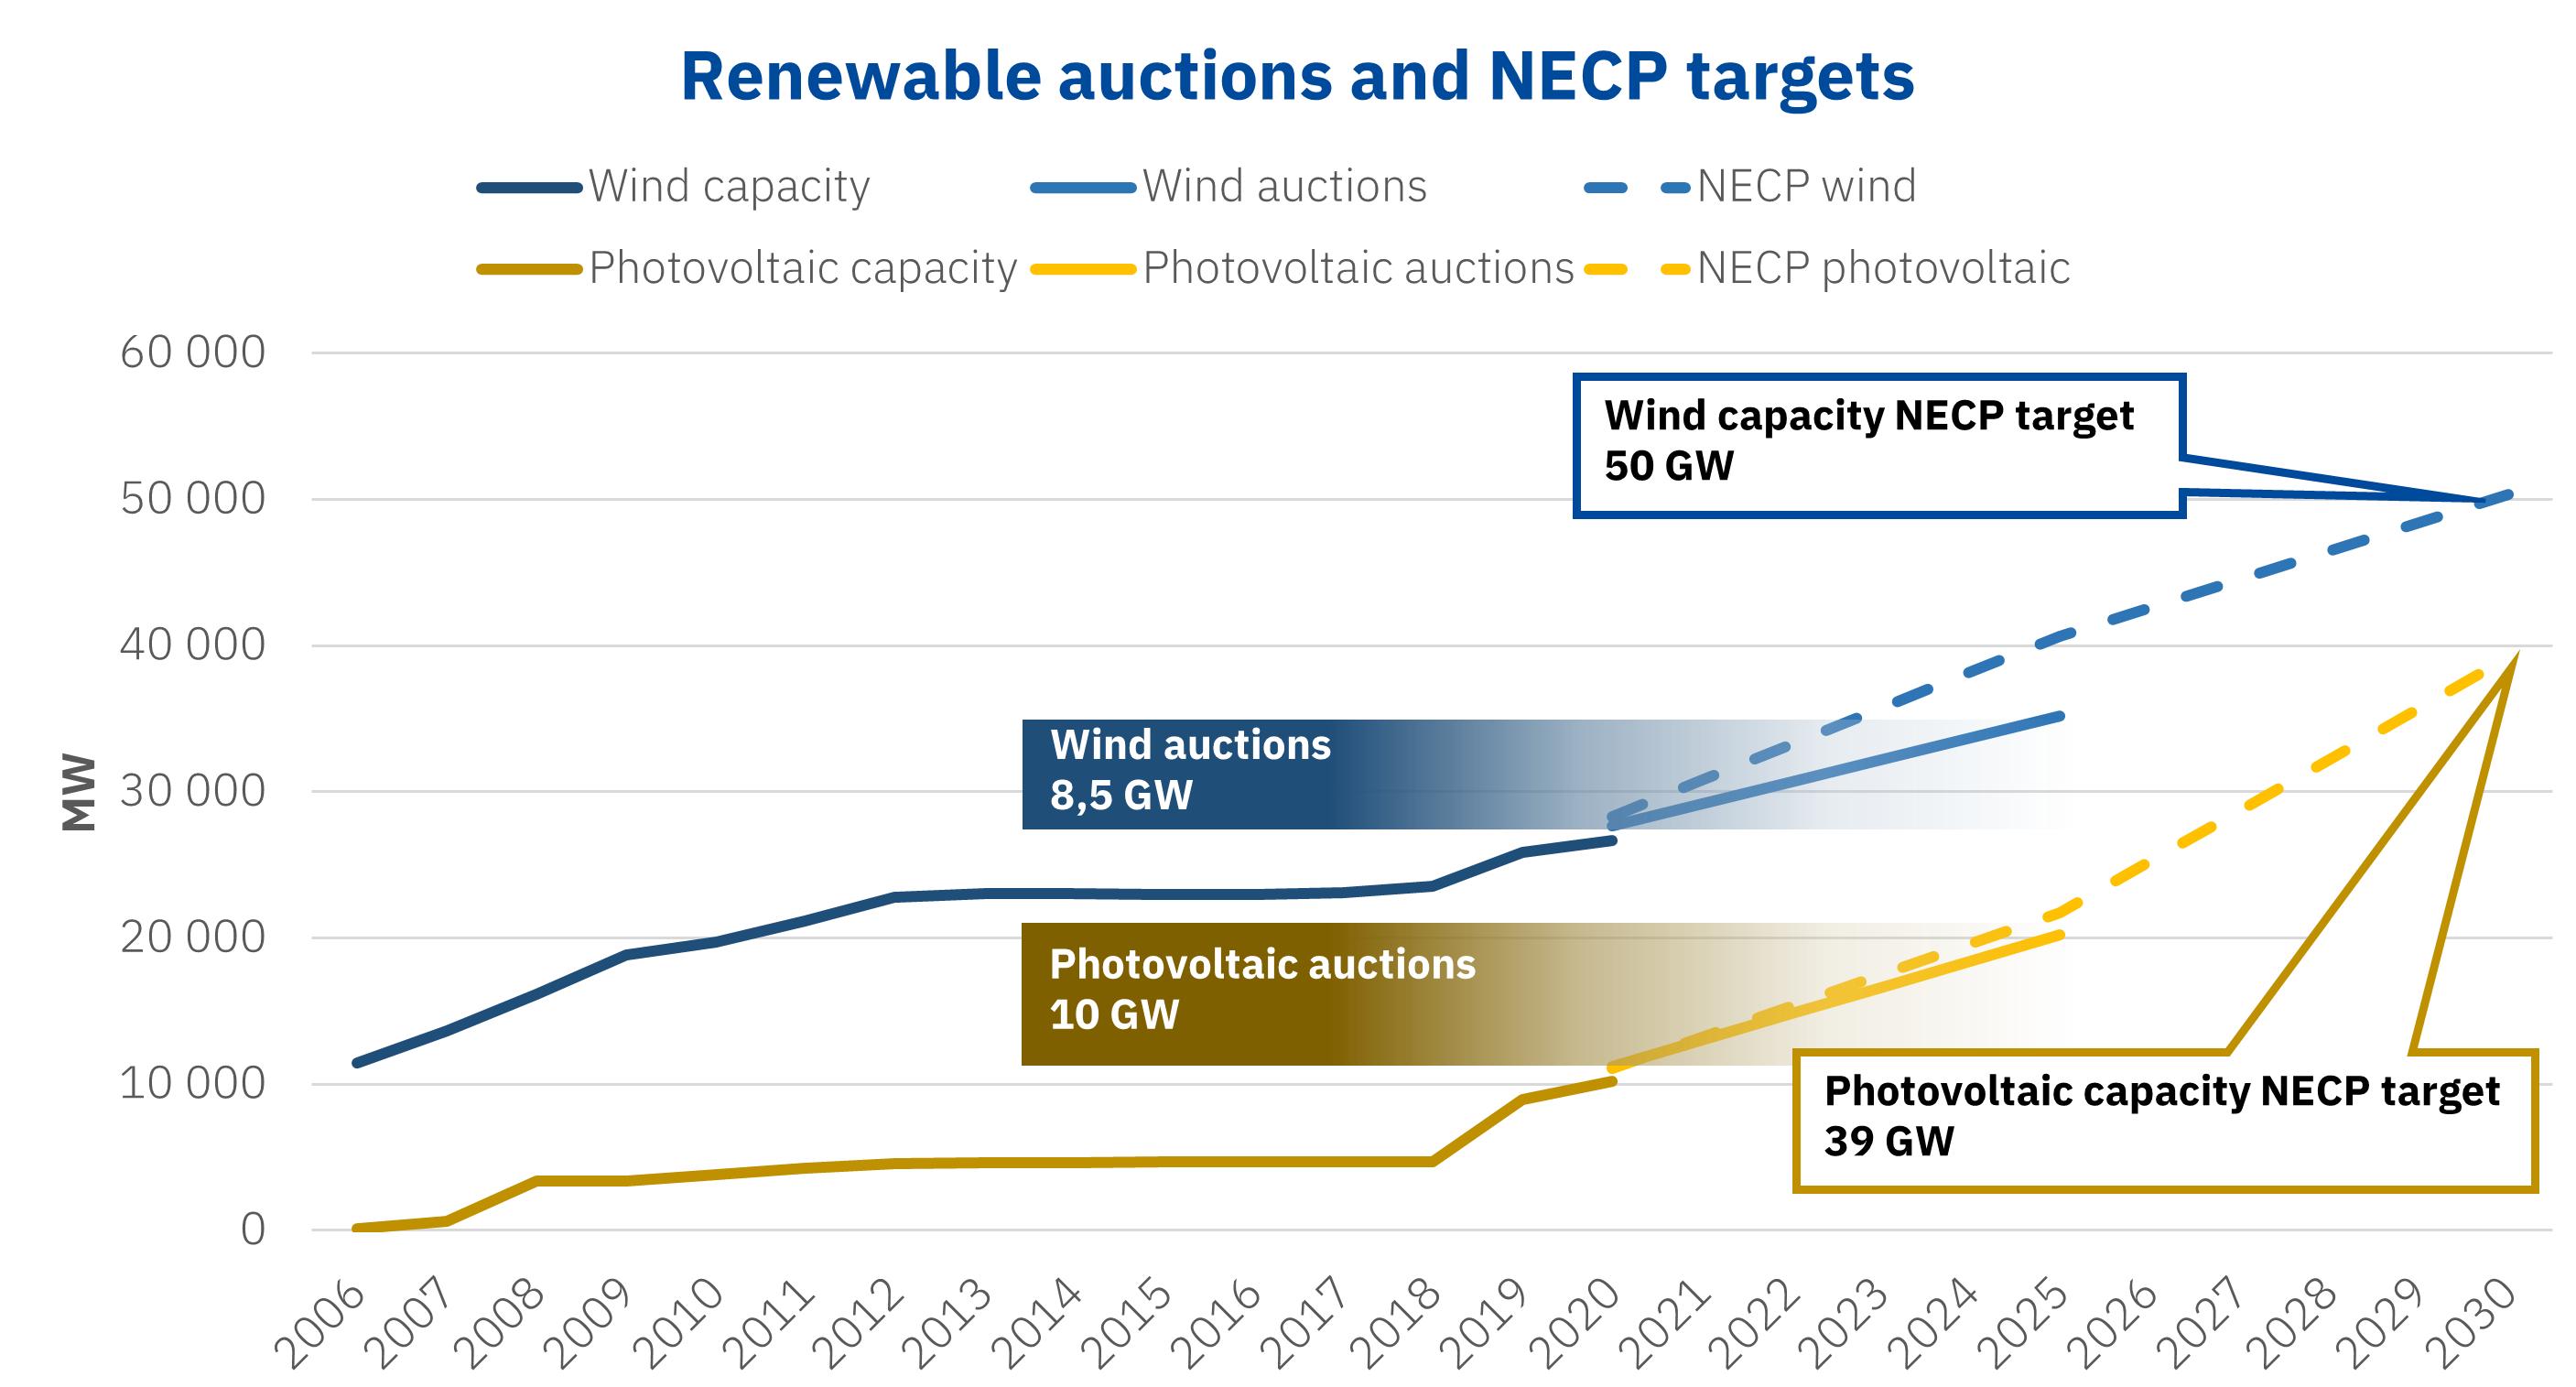 AleaSoft - Renewable auctions solar photovoltaic wind energy NECP